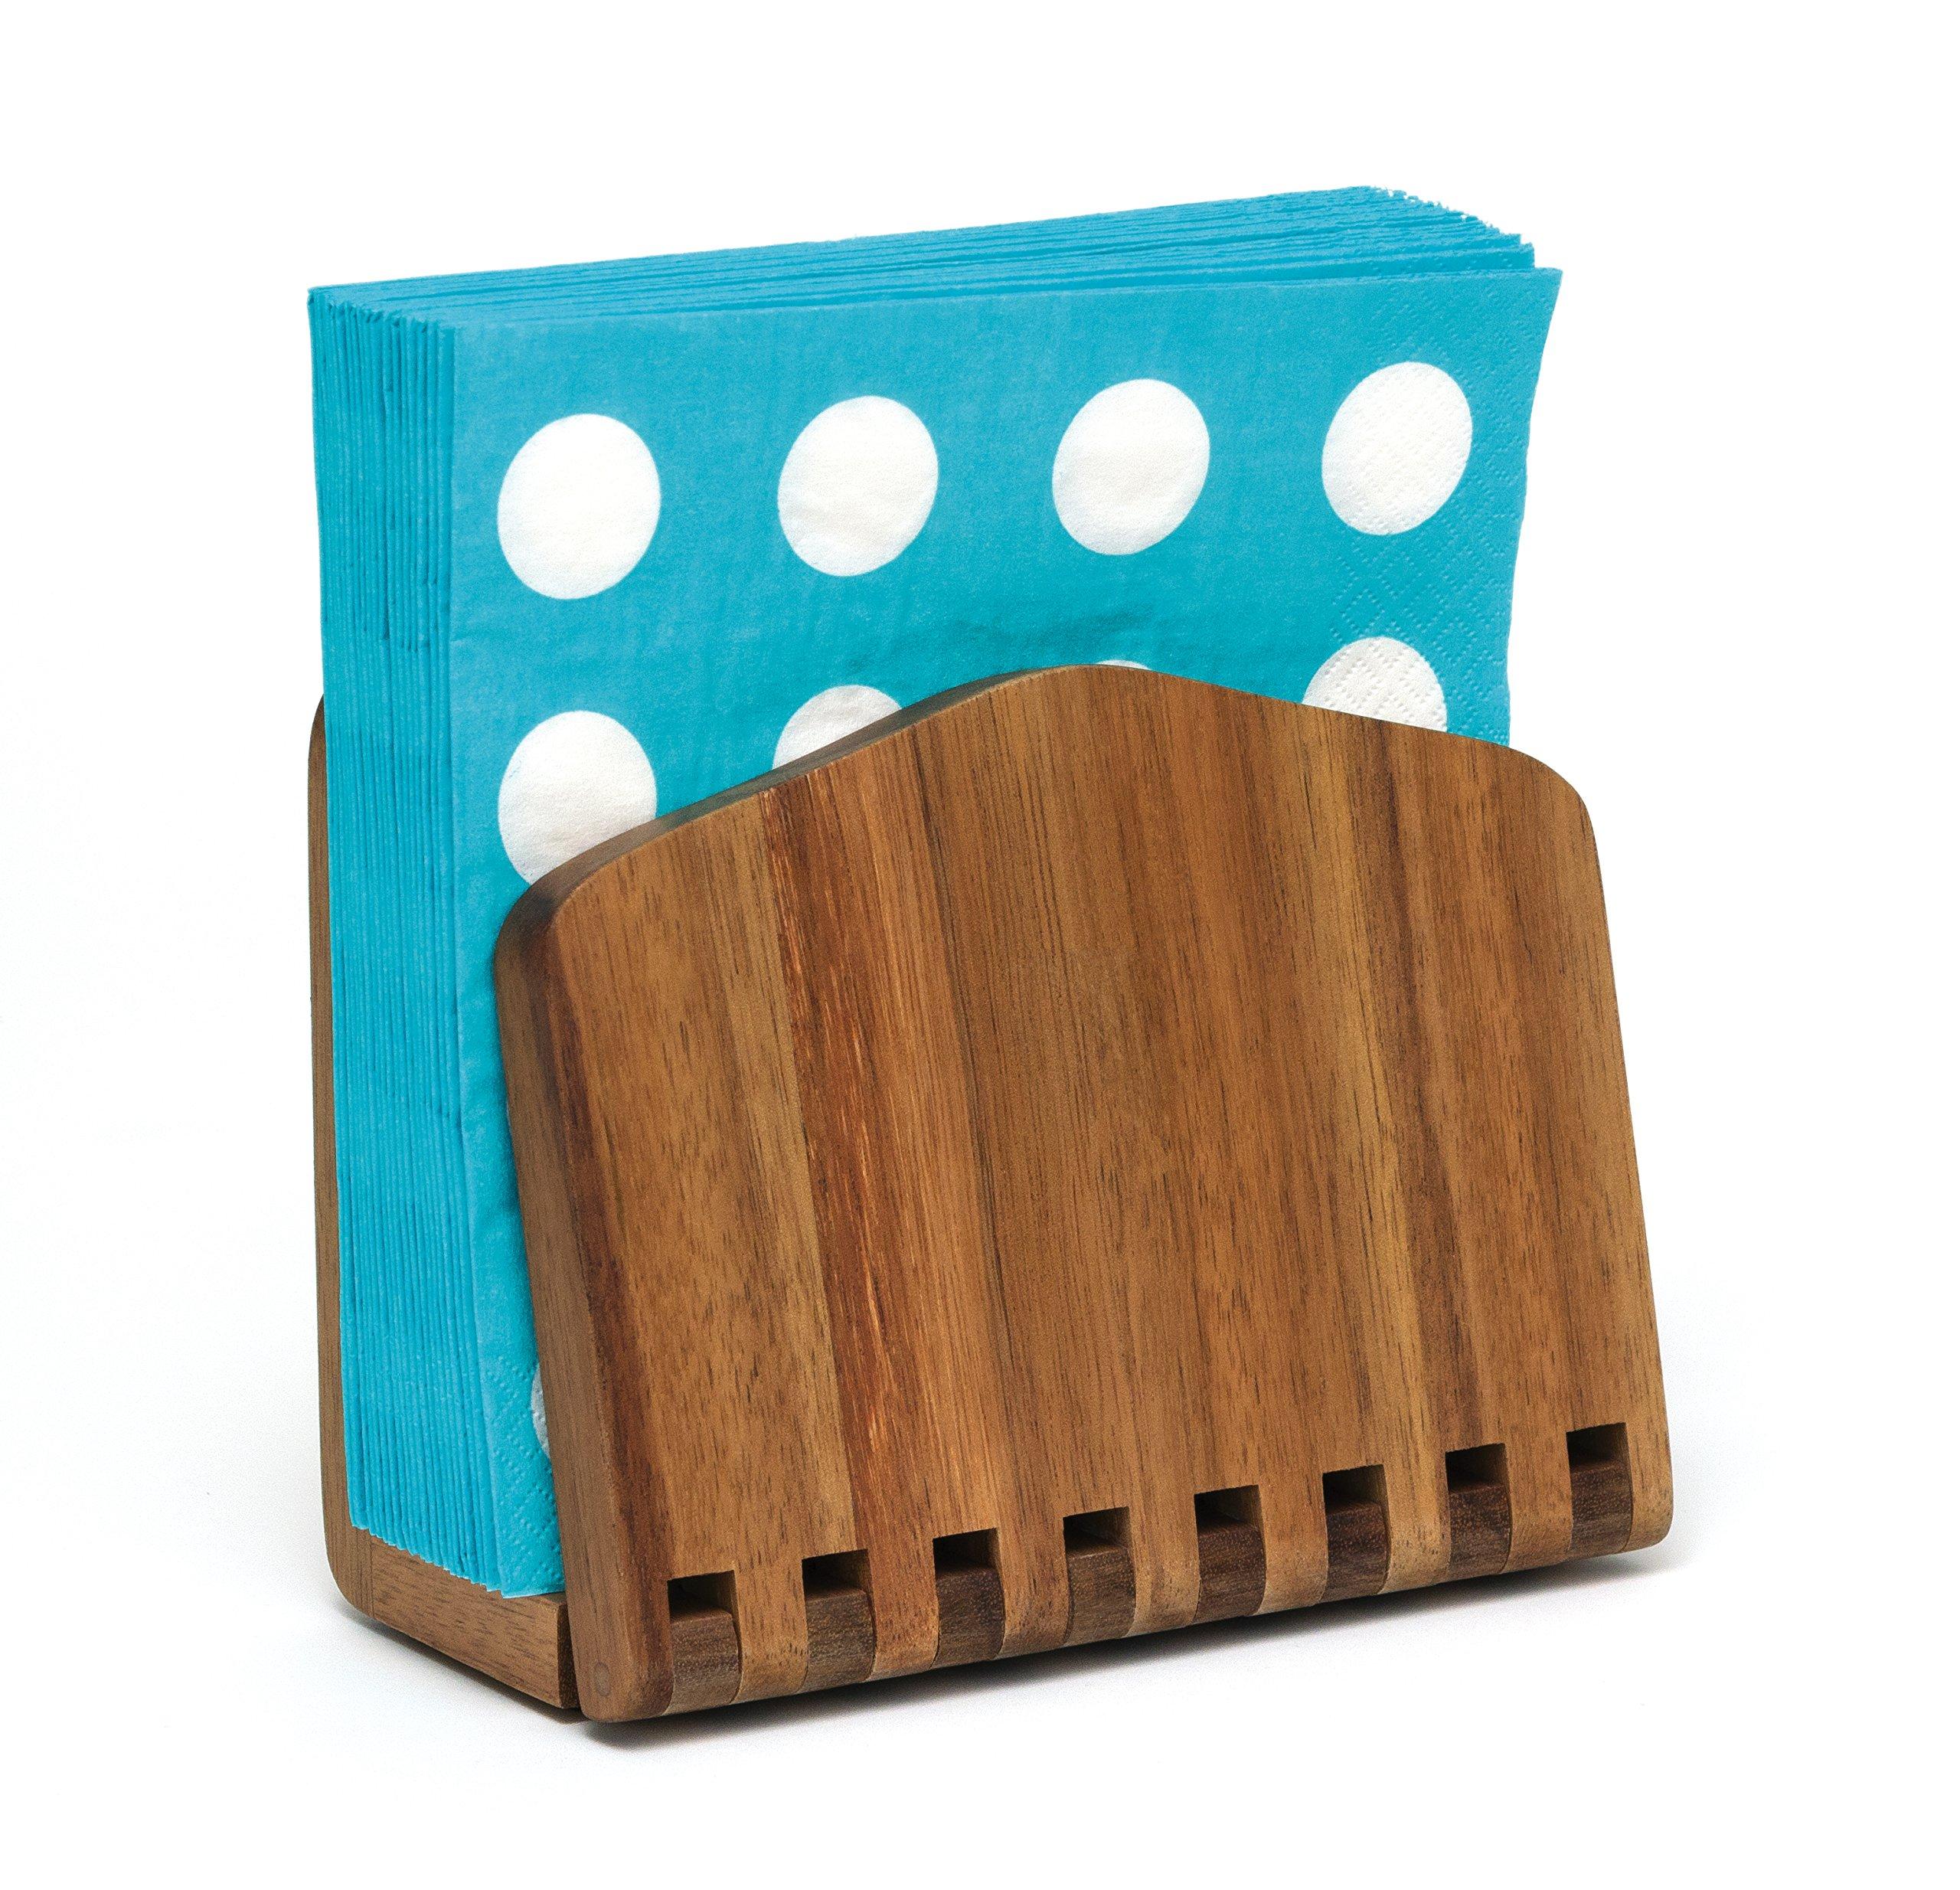 Lipper International 1160 Acacia Wood Adjustable Napkin Holder, 6-1/2'' x 3-1/4'' x 6'' by Lipper International (Image #2)